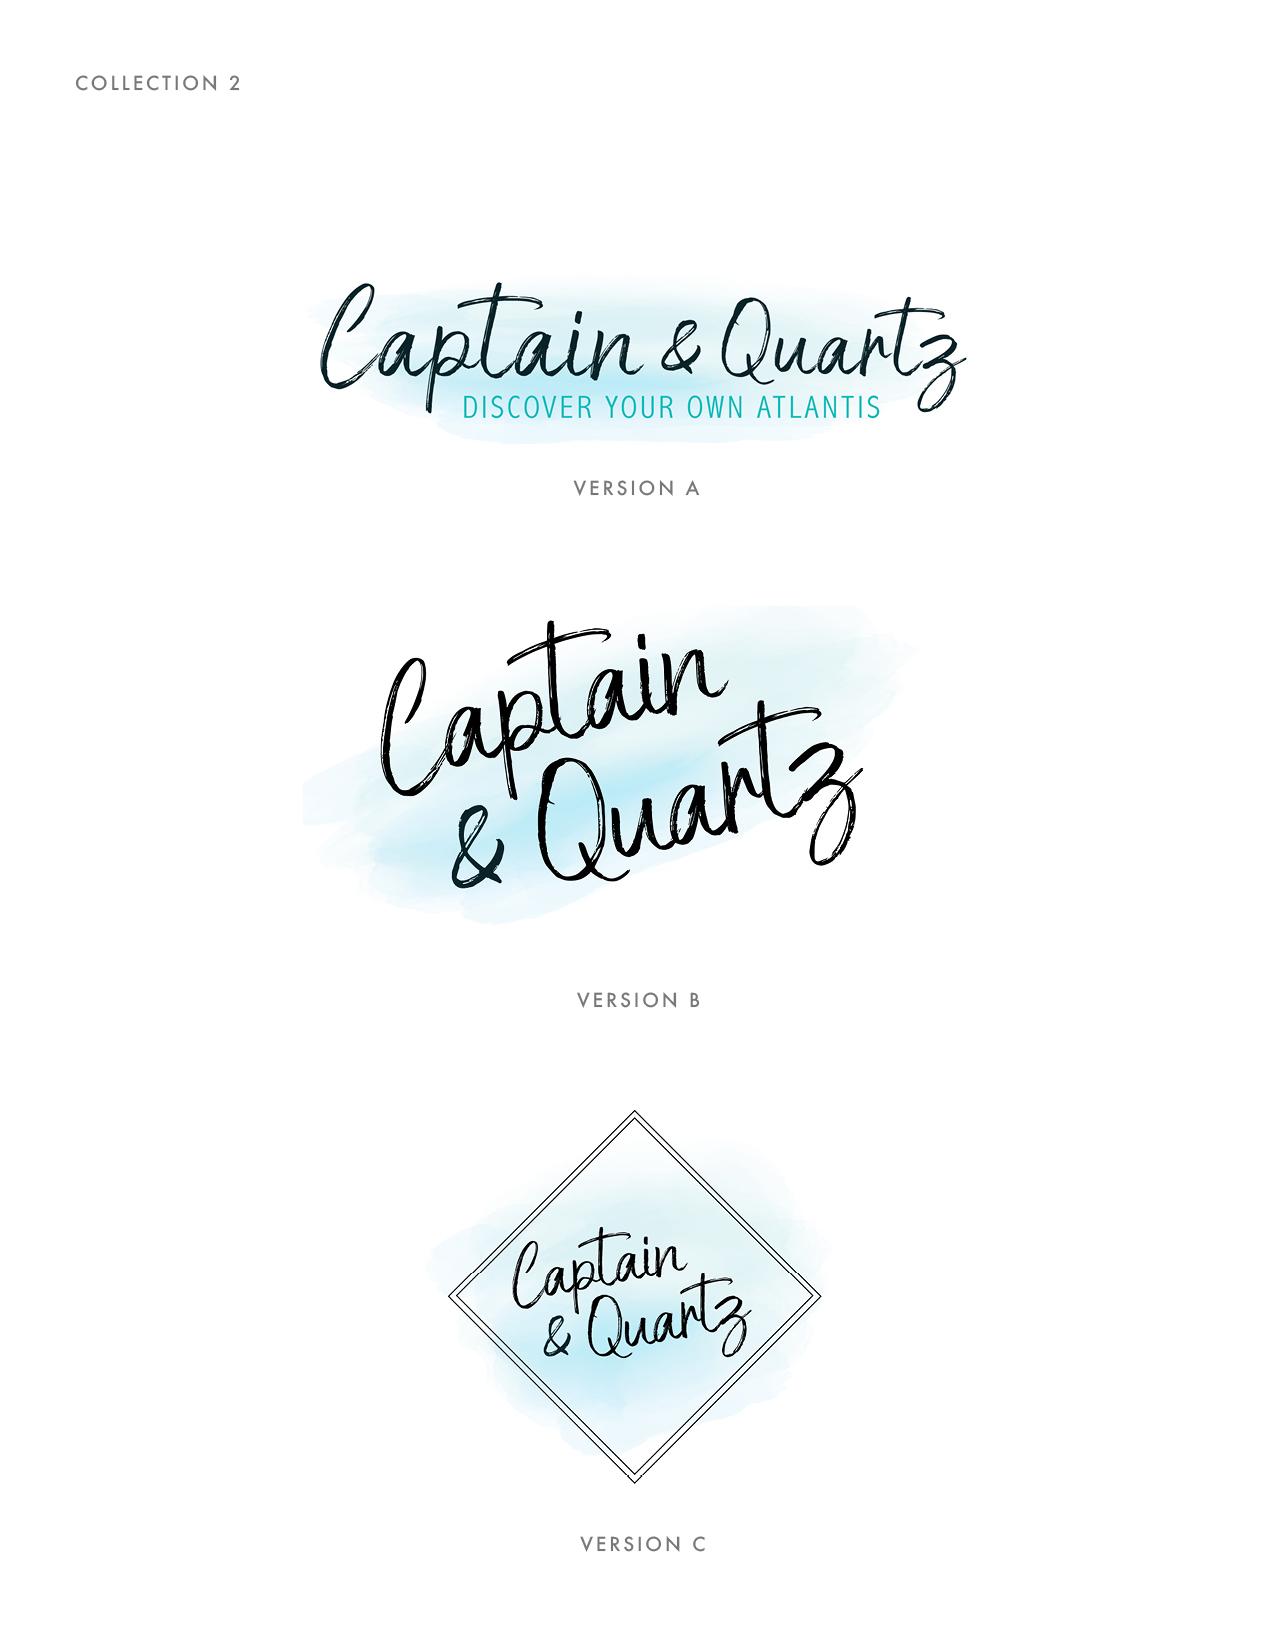 CaptainandQuartz_Logos1_Presentation2.jpg